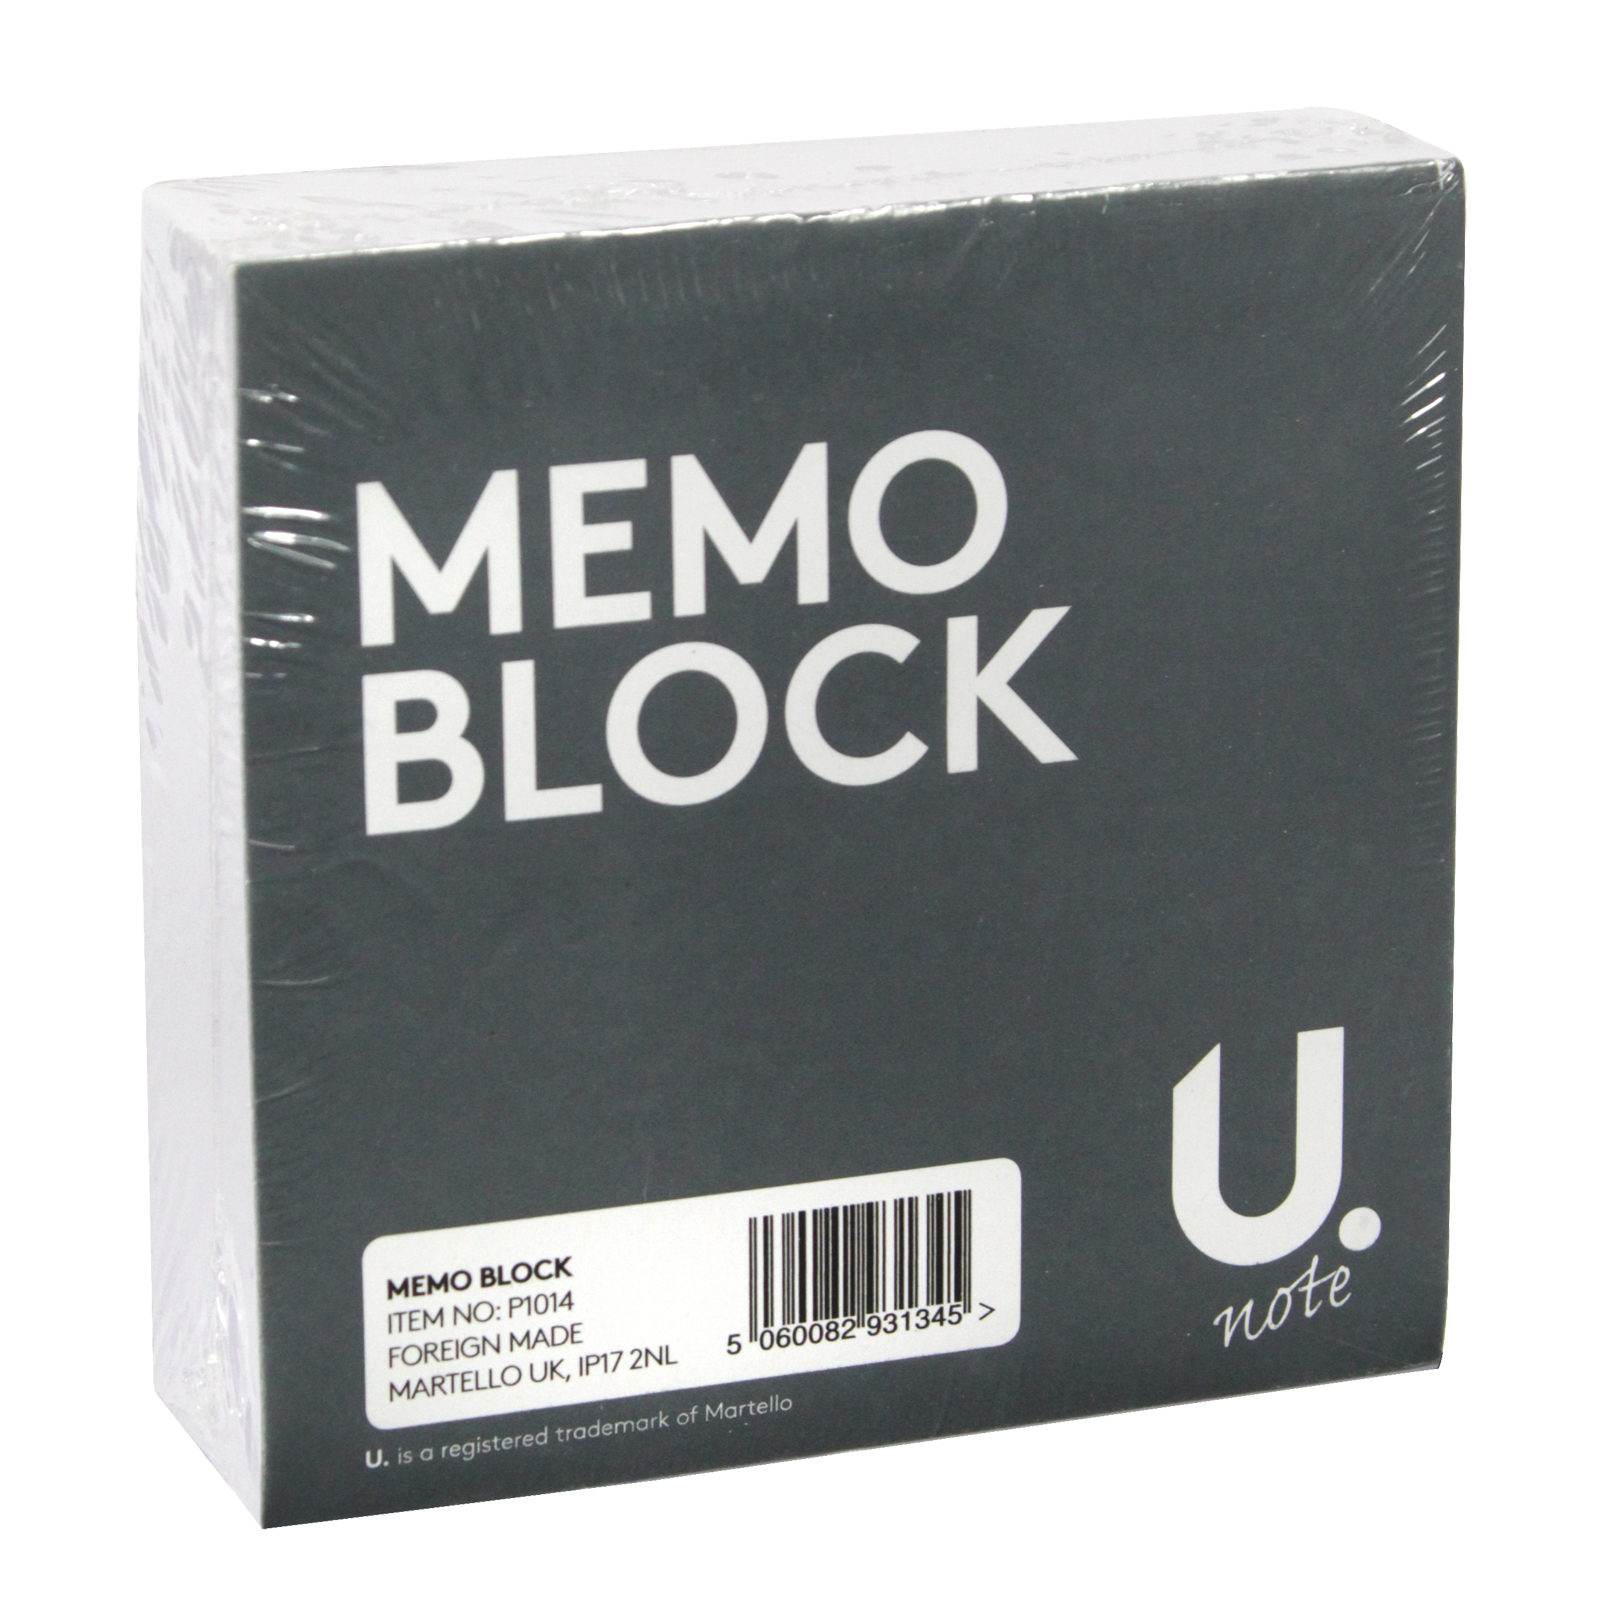 PENNINE MEMO BLOCK X12